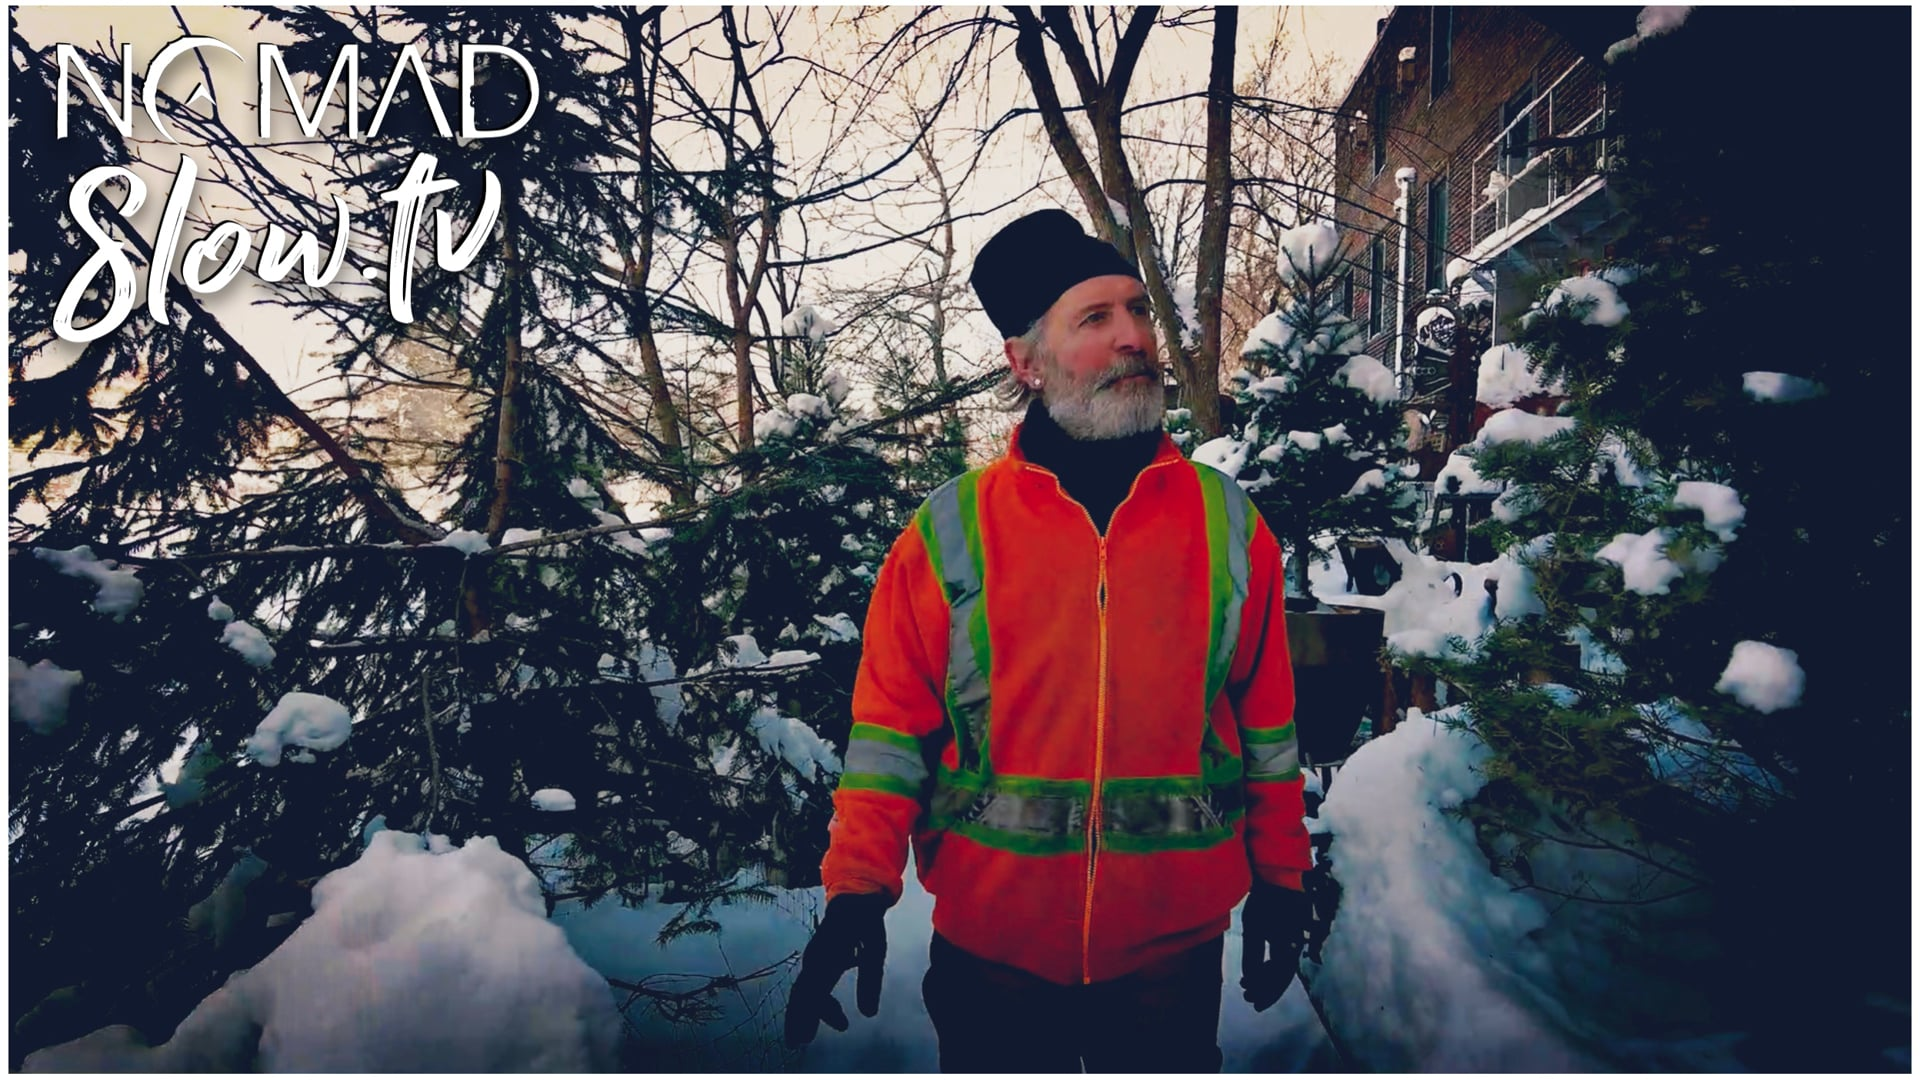 Glen Le Mesurier Builds Bird Houses | I Am Running Down the Long Hallway of Viewmont Elementary - Chris Zabriskie